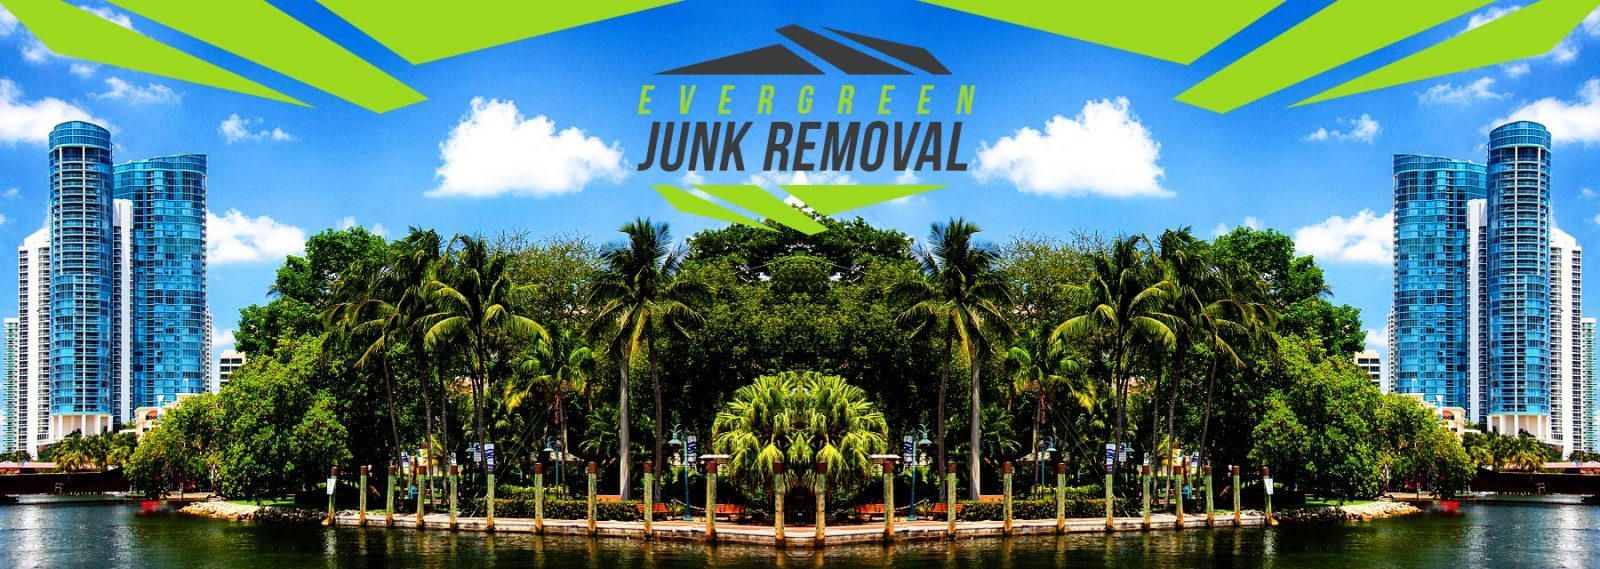 Andover Hot Tub Removal Company